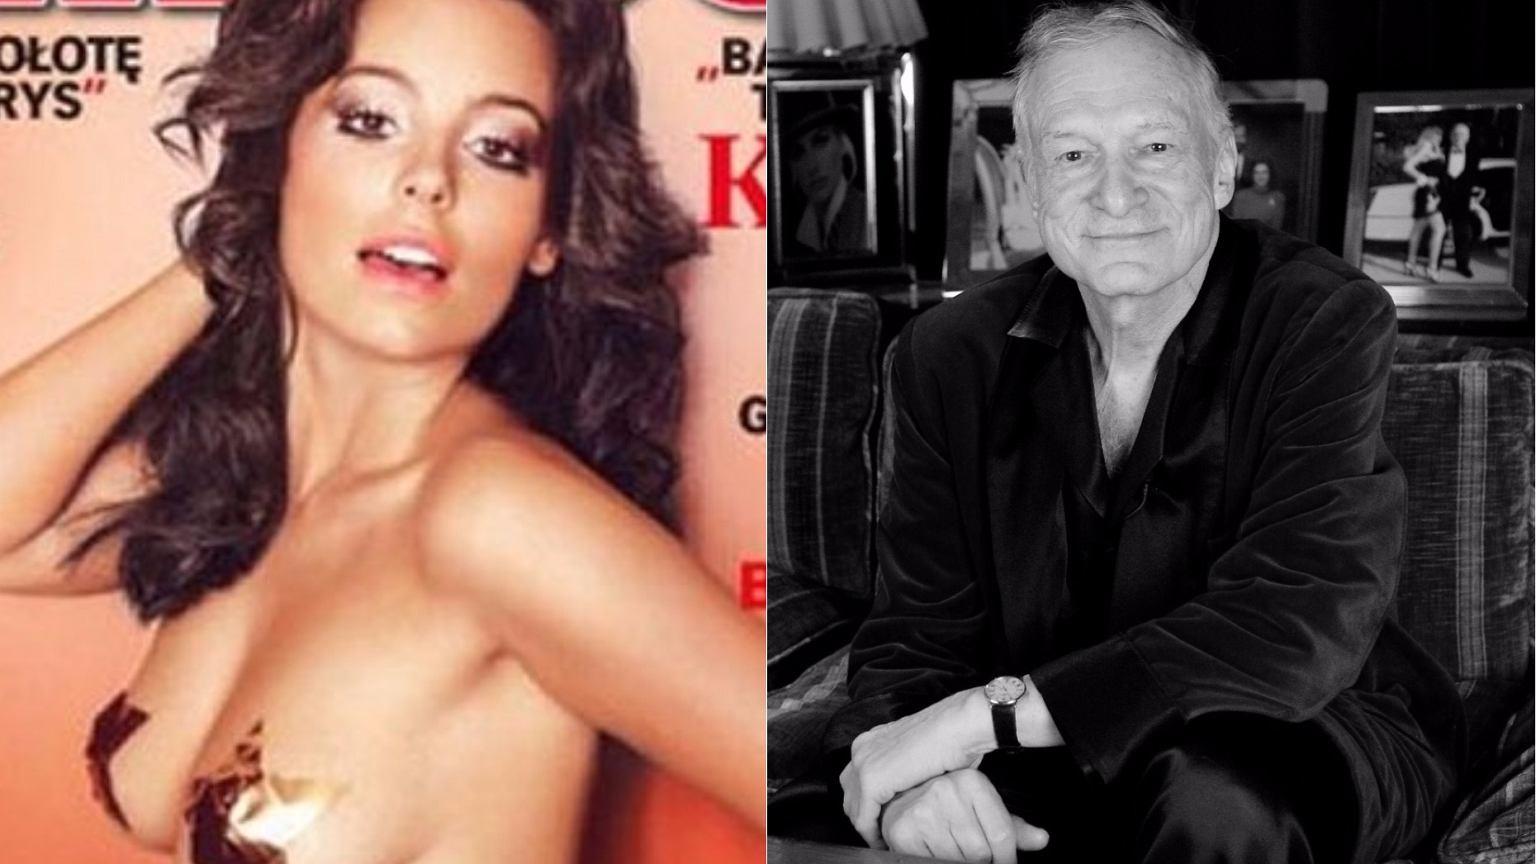 Anna Mucha Playboy anna mucha �egna hugh hefnera. to najbardziej nieoczekiwany